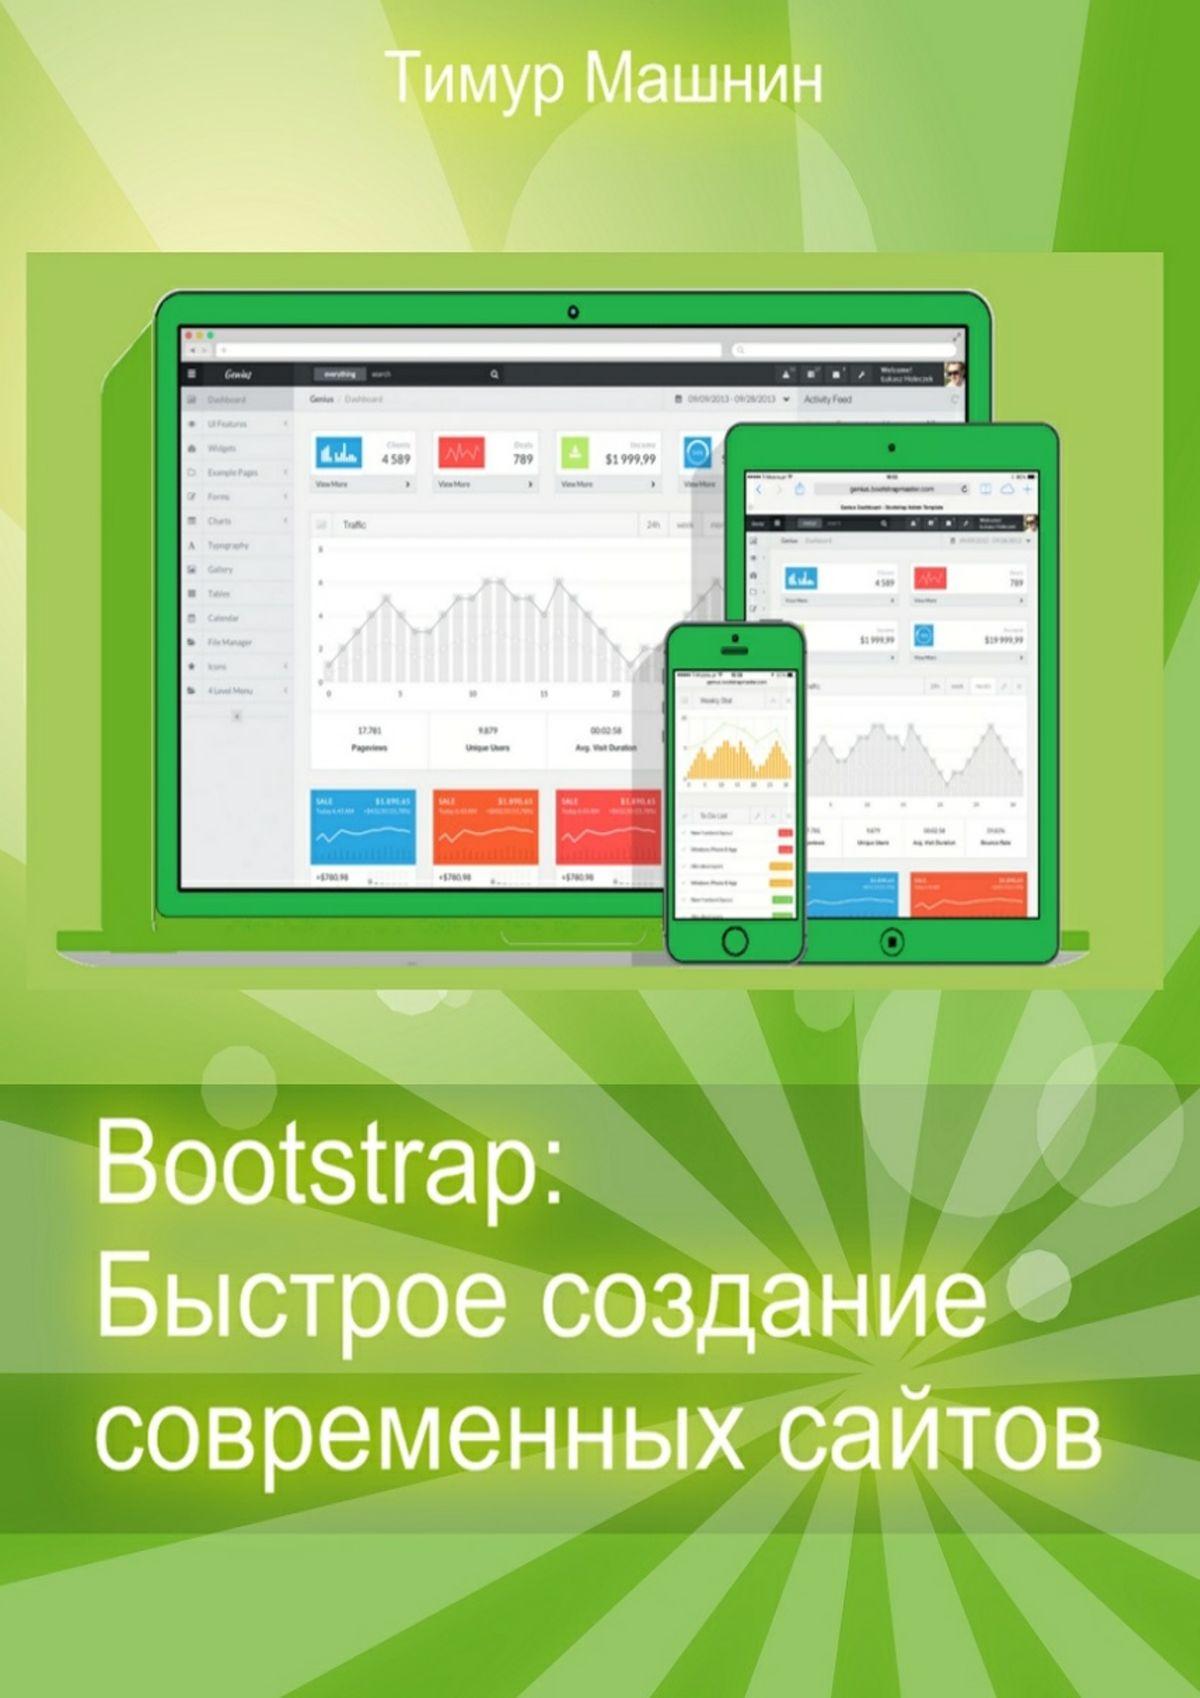 Фото - Тимур Машнин Bootstrap: Быстрое создание современных сайтов тимур машнин bootstrap быстрое создание современных сайтов